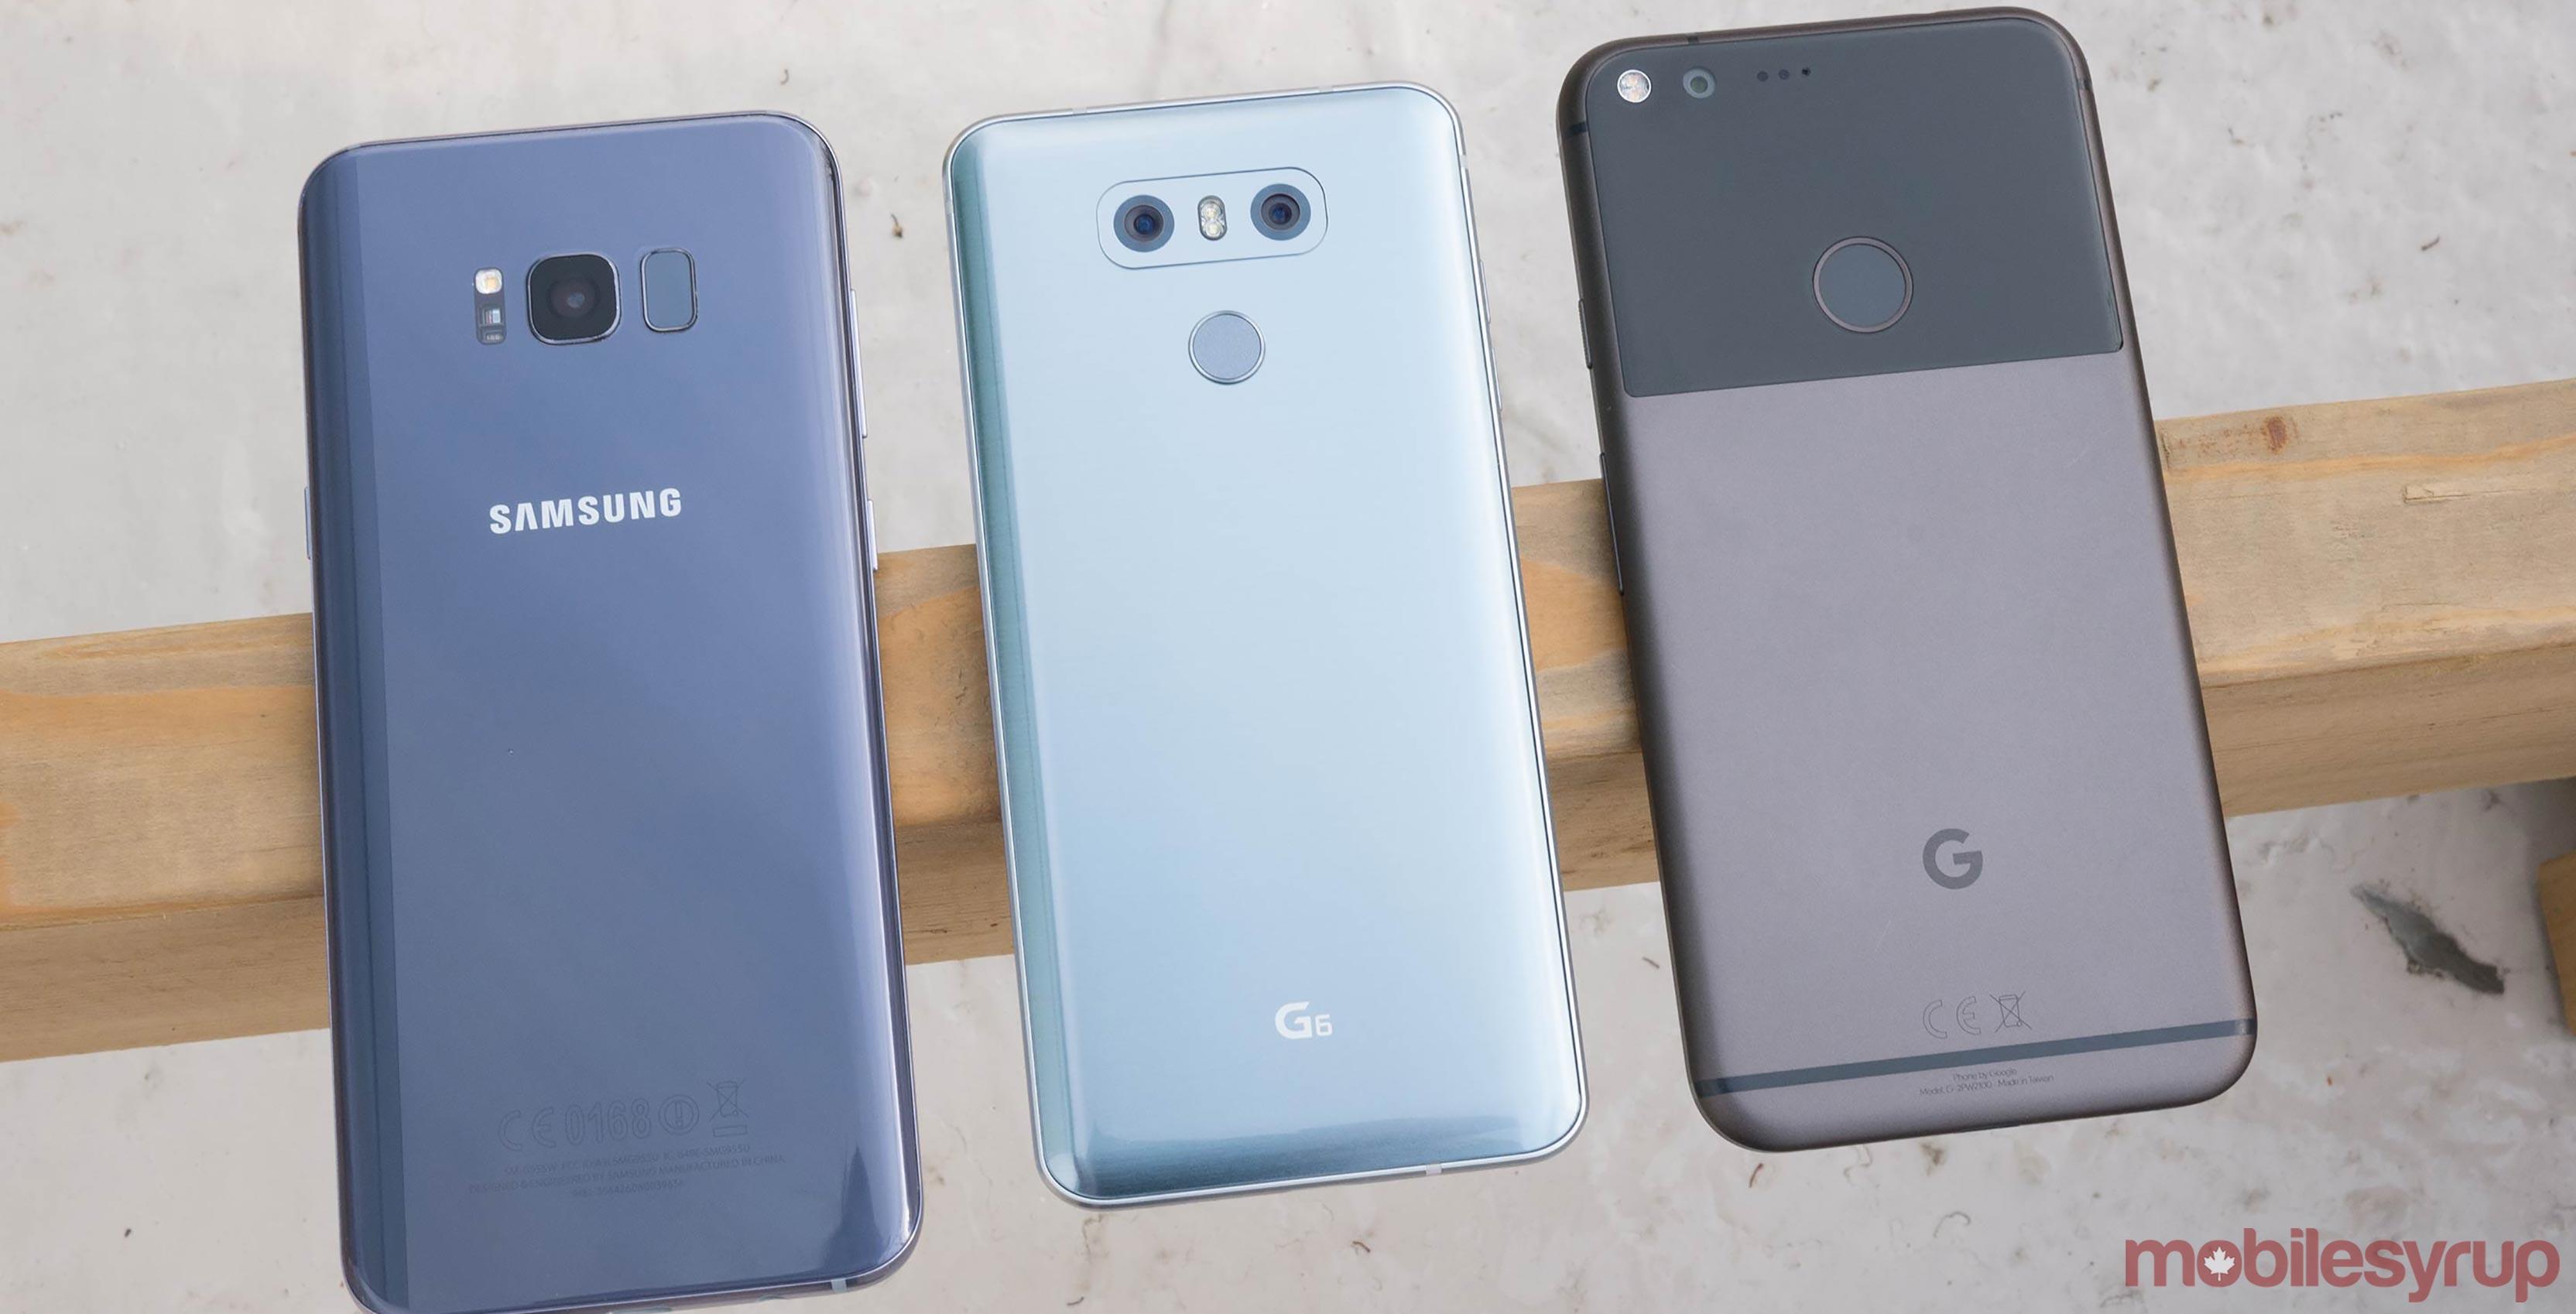 Galaxy S8, LG G6, Google Pixel